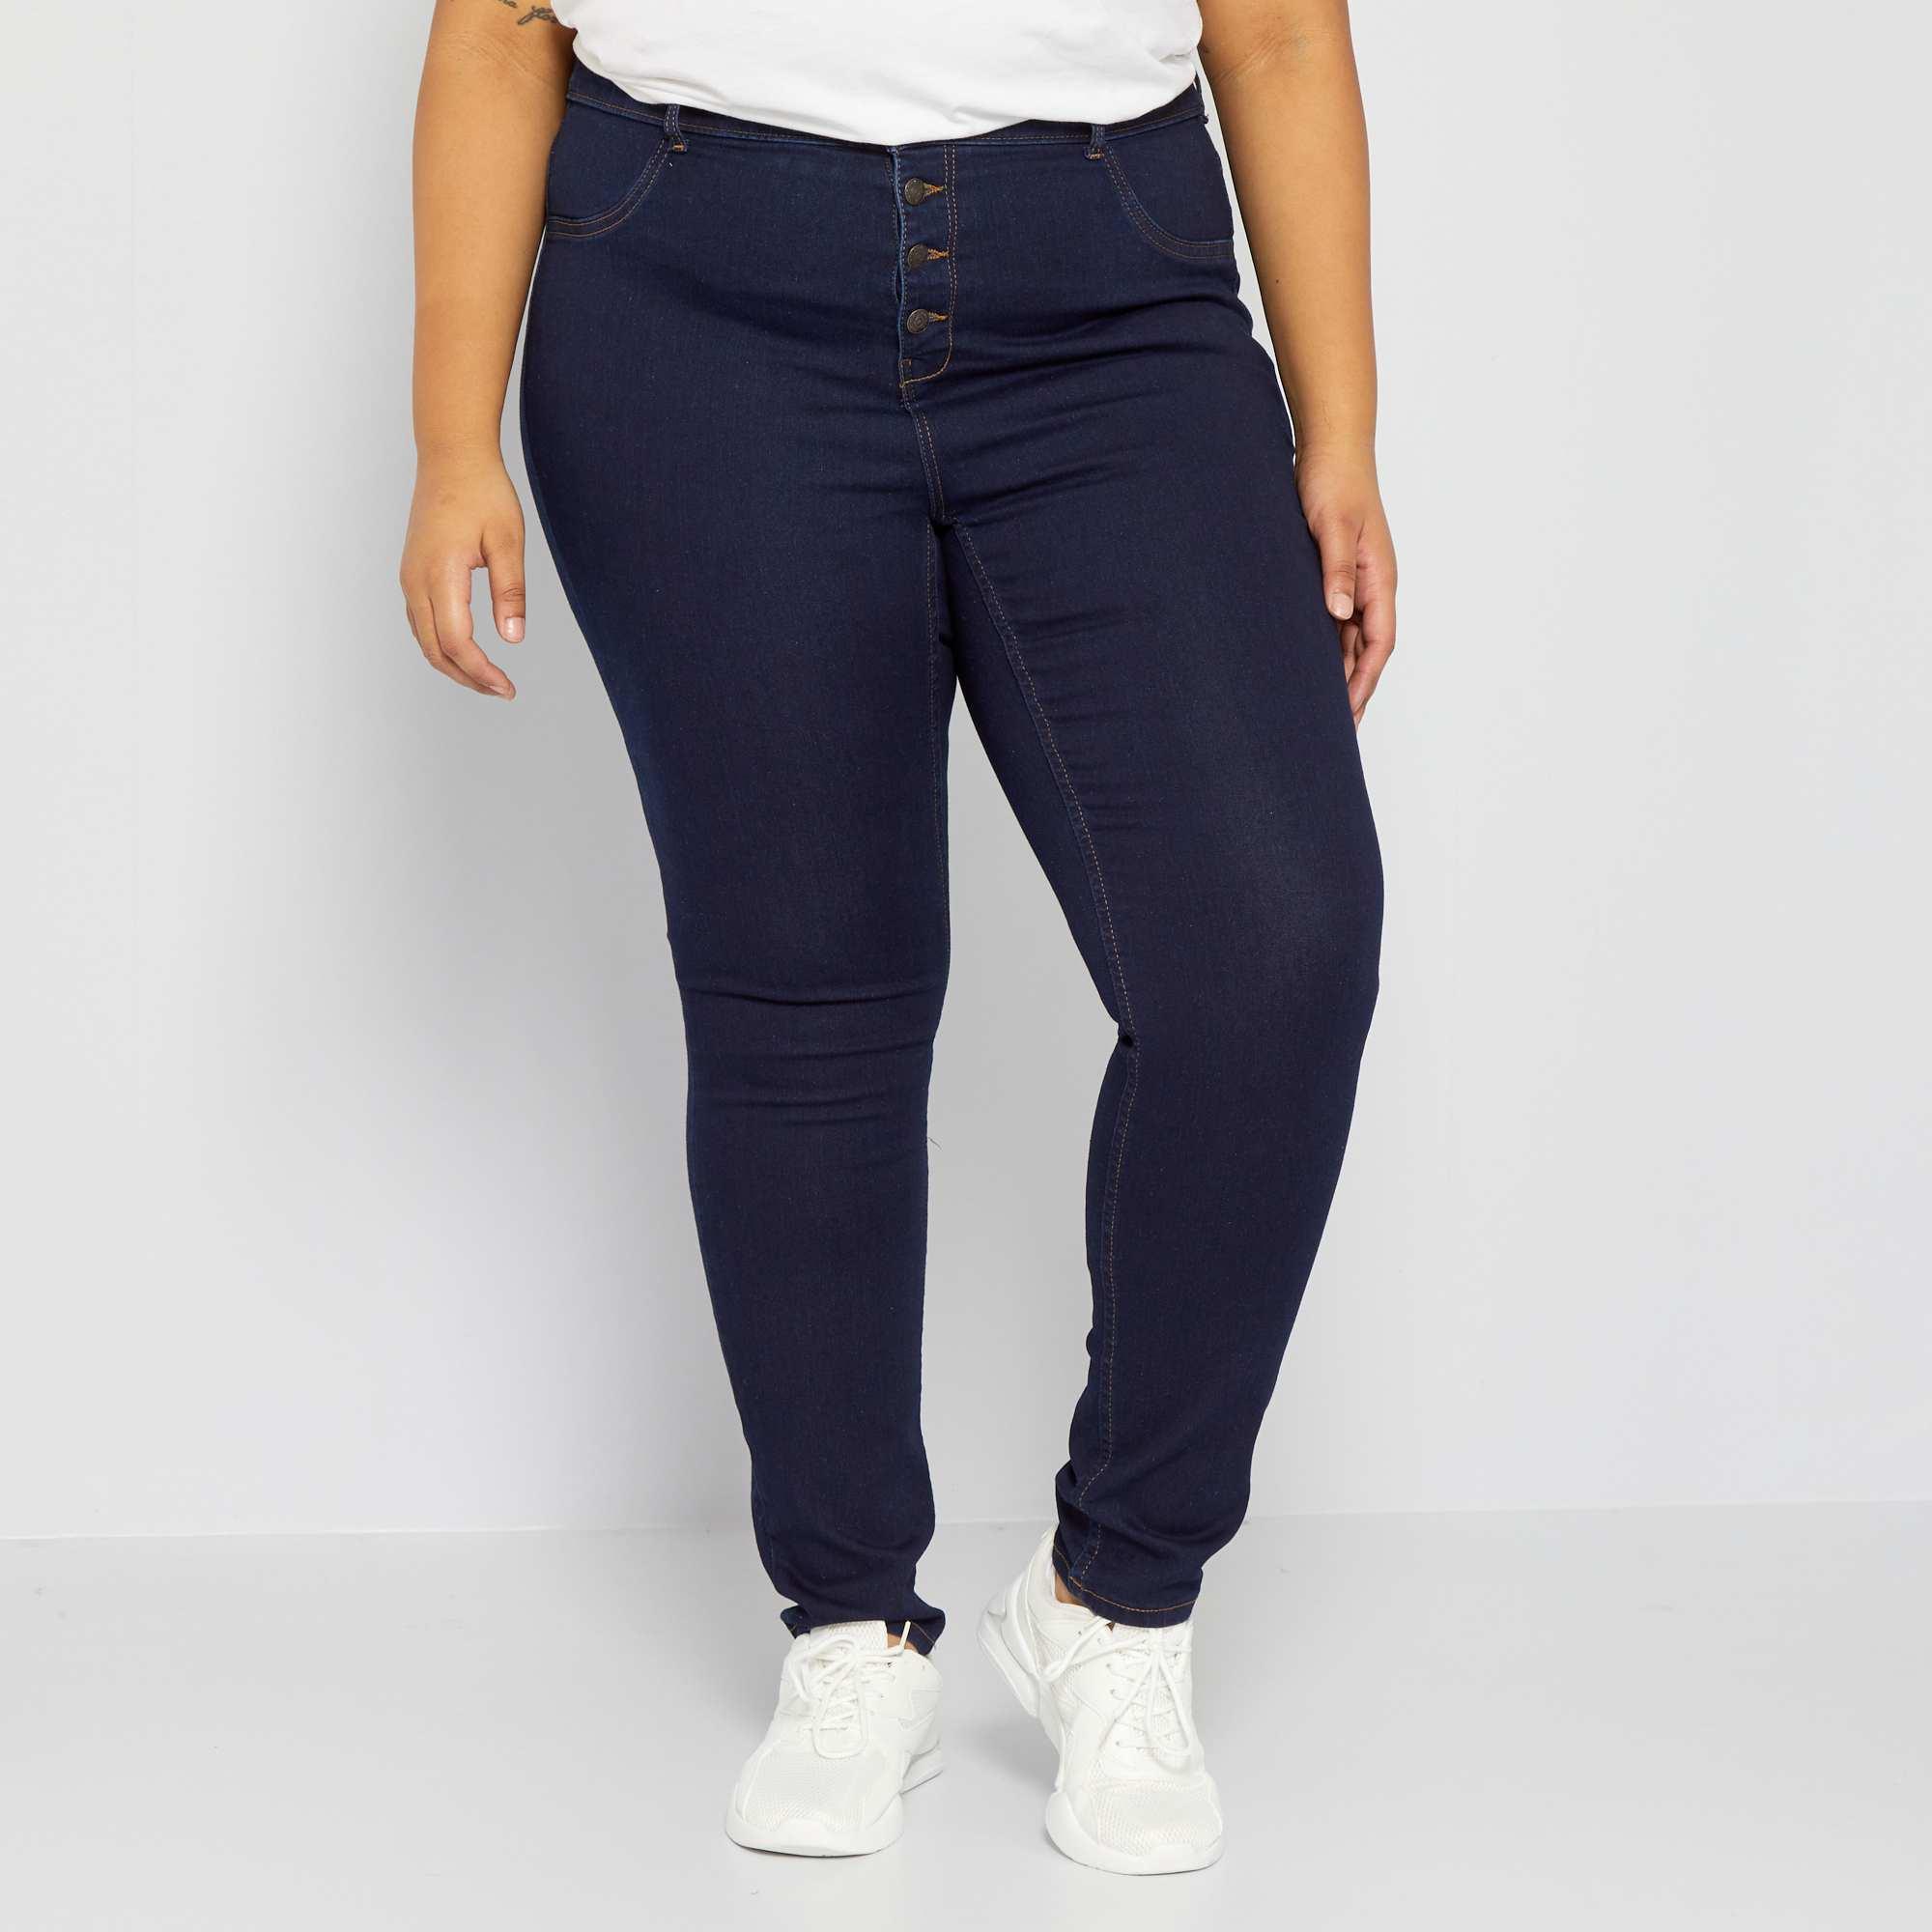 jean skinny en denim stretch taille haute grande taille femme rinse kiabi 20 00. Black Bedroom Furniture Sets. Home Design Ideas